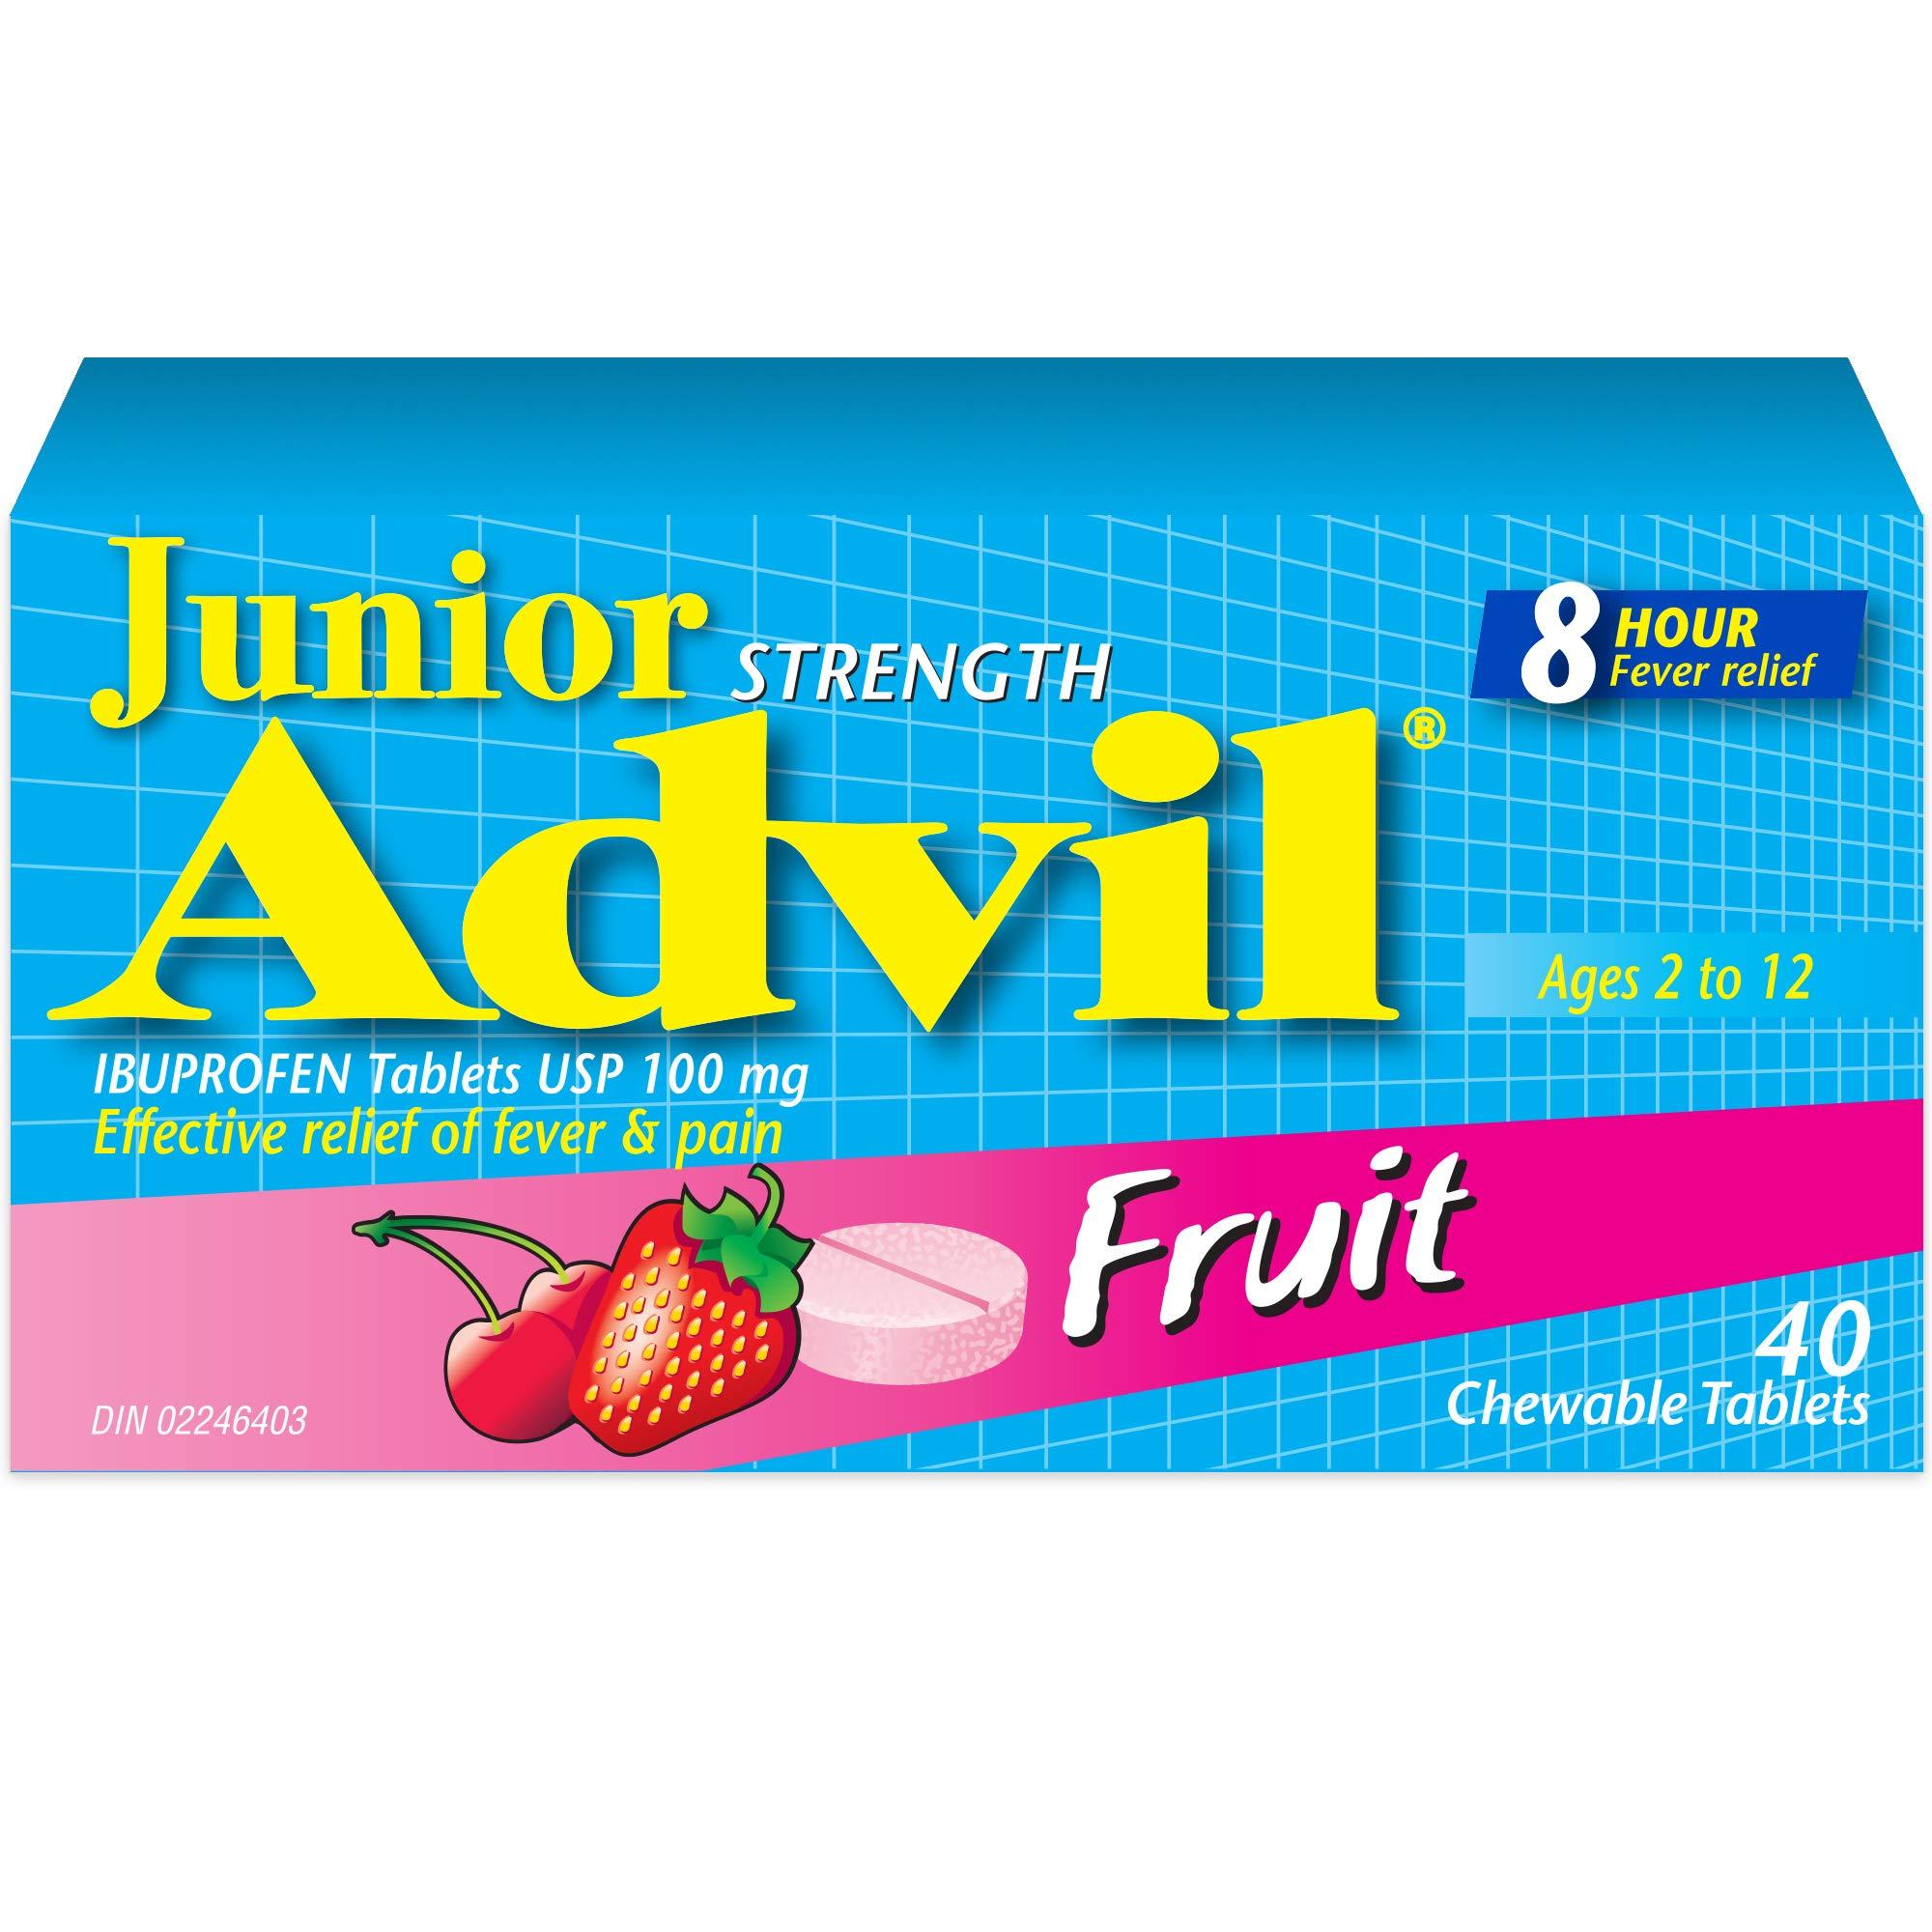 Junior Strength Advil Ibuprofen Tablets Usp 100 mg Fruit 40 Chewable Tablets by Advil